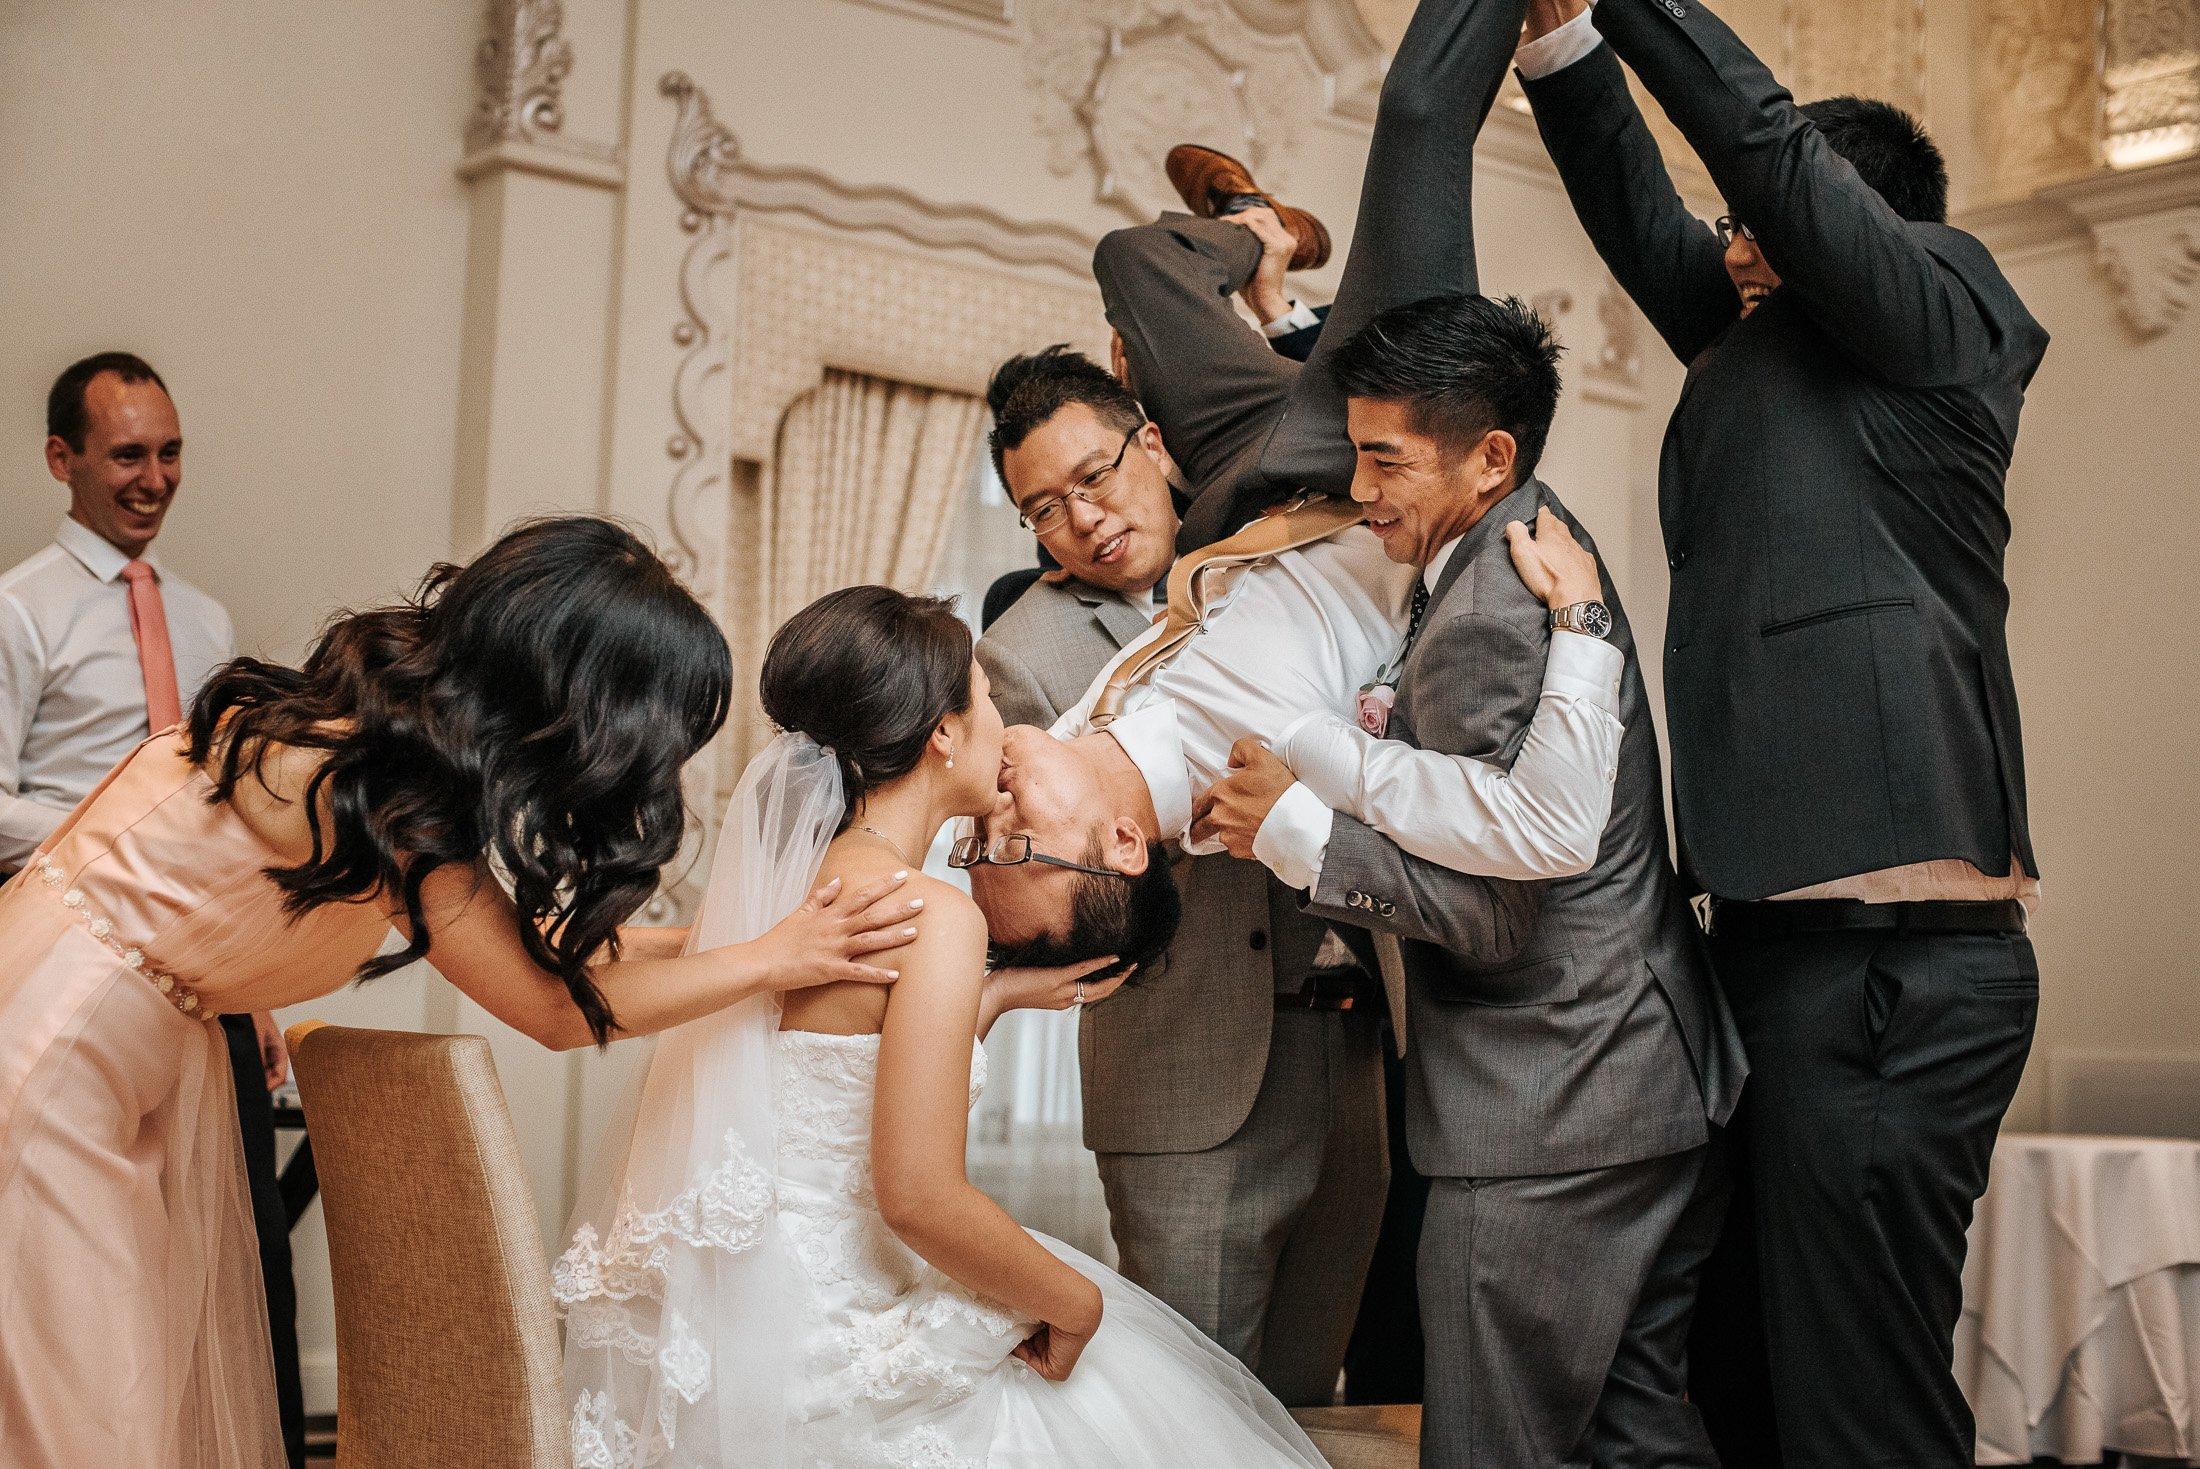 011 Hotel Georgia weddings vancouver